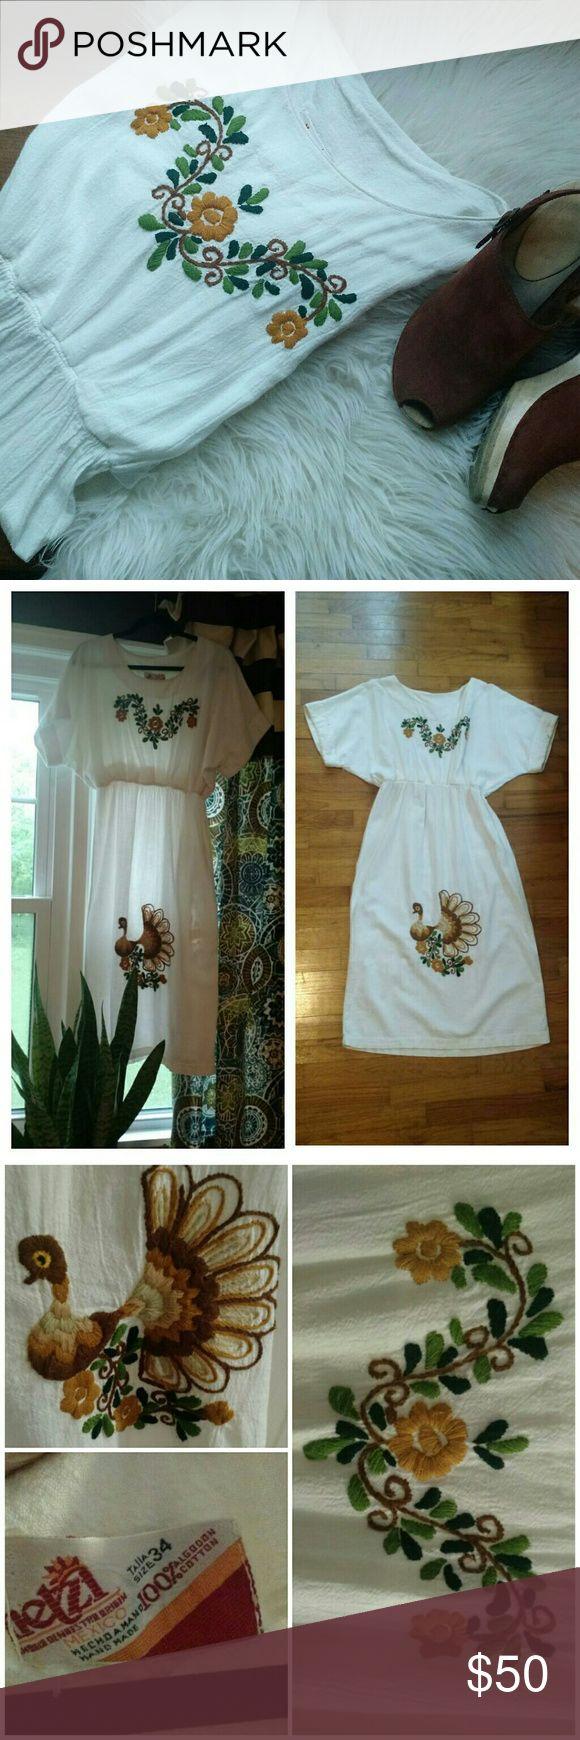 Boho embroidered dress So boho, fantastic.  Embroidered cream/white cotton kaftan type midi dress.  Cute bird, floral design.  True vintage.  Made in Mexico. Minimalist, gypsy, festival. Dresses Midi